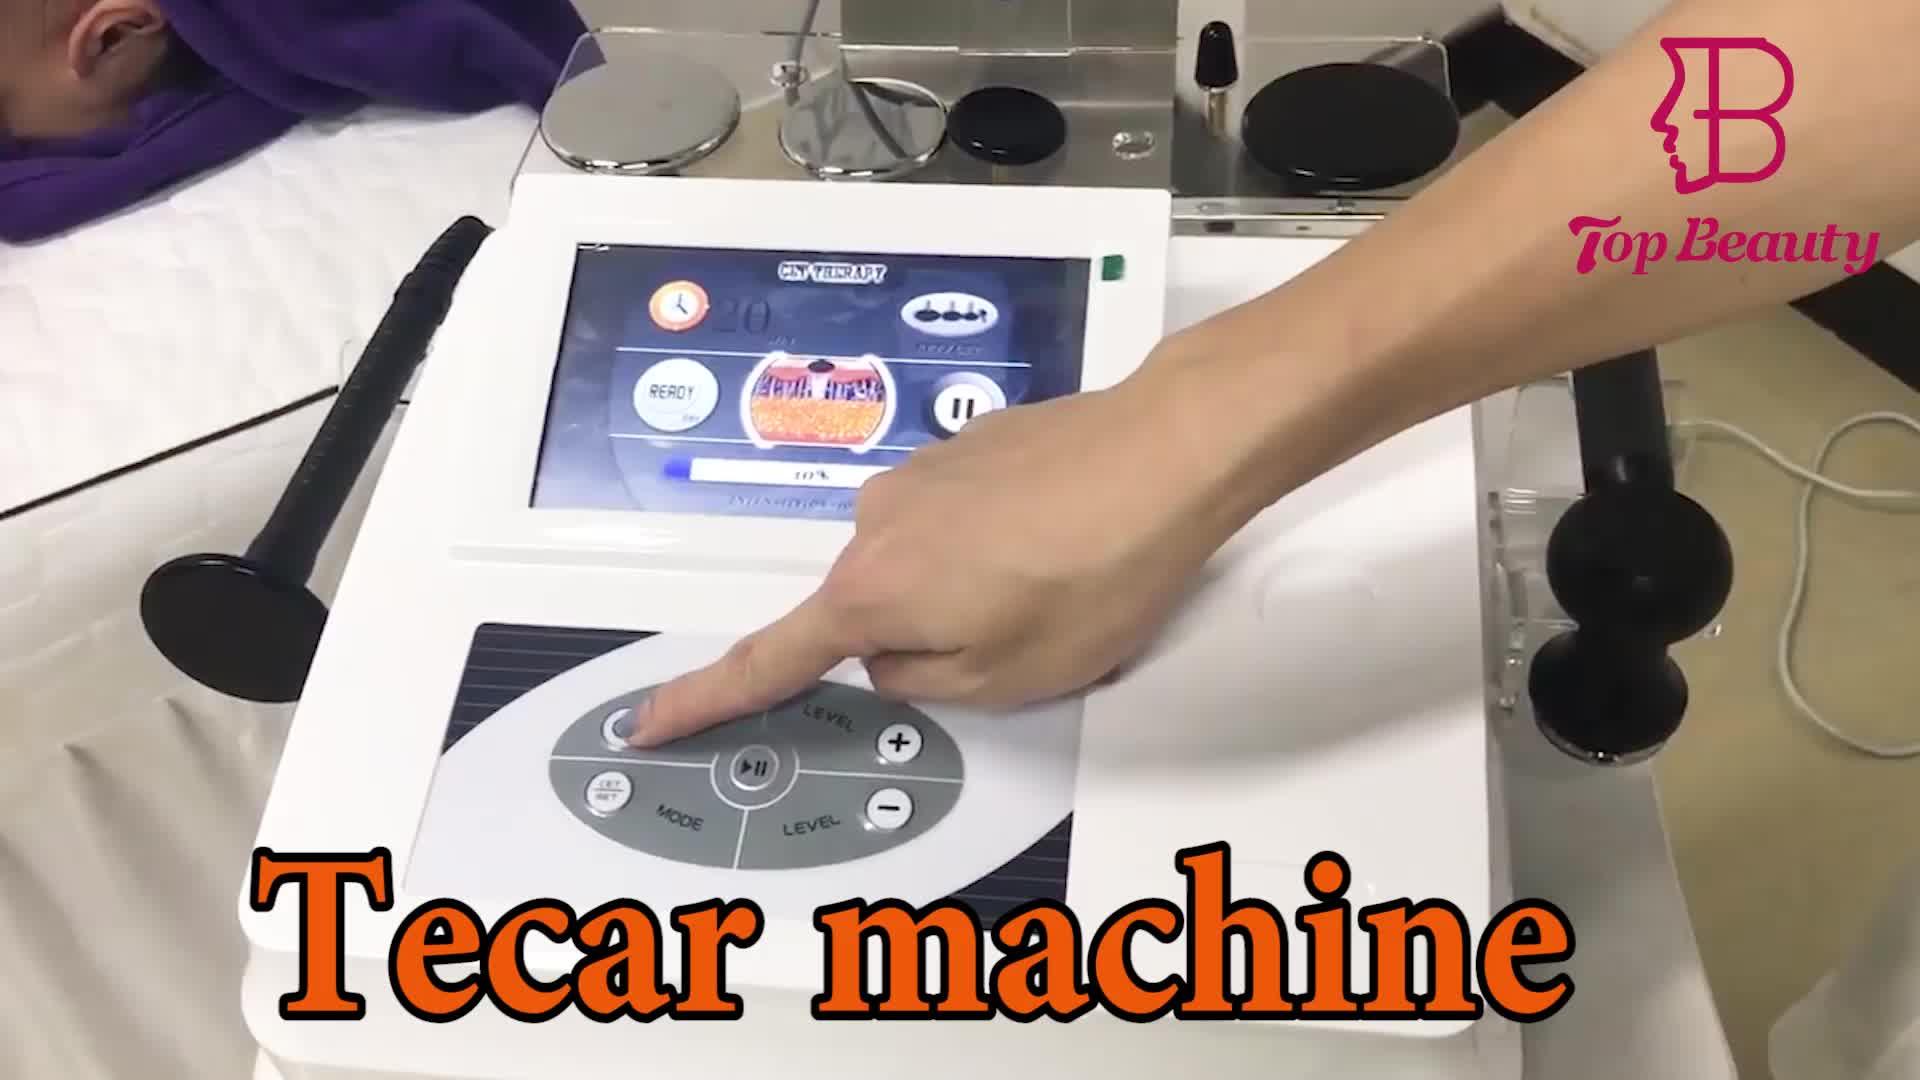 Terapia física tecar/tecar therapi diatermia, máquina de diatermia tecar/tecarterapia